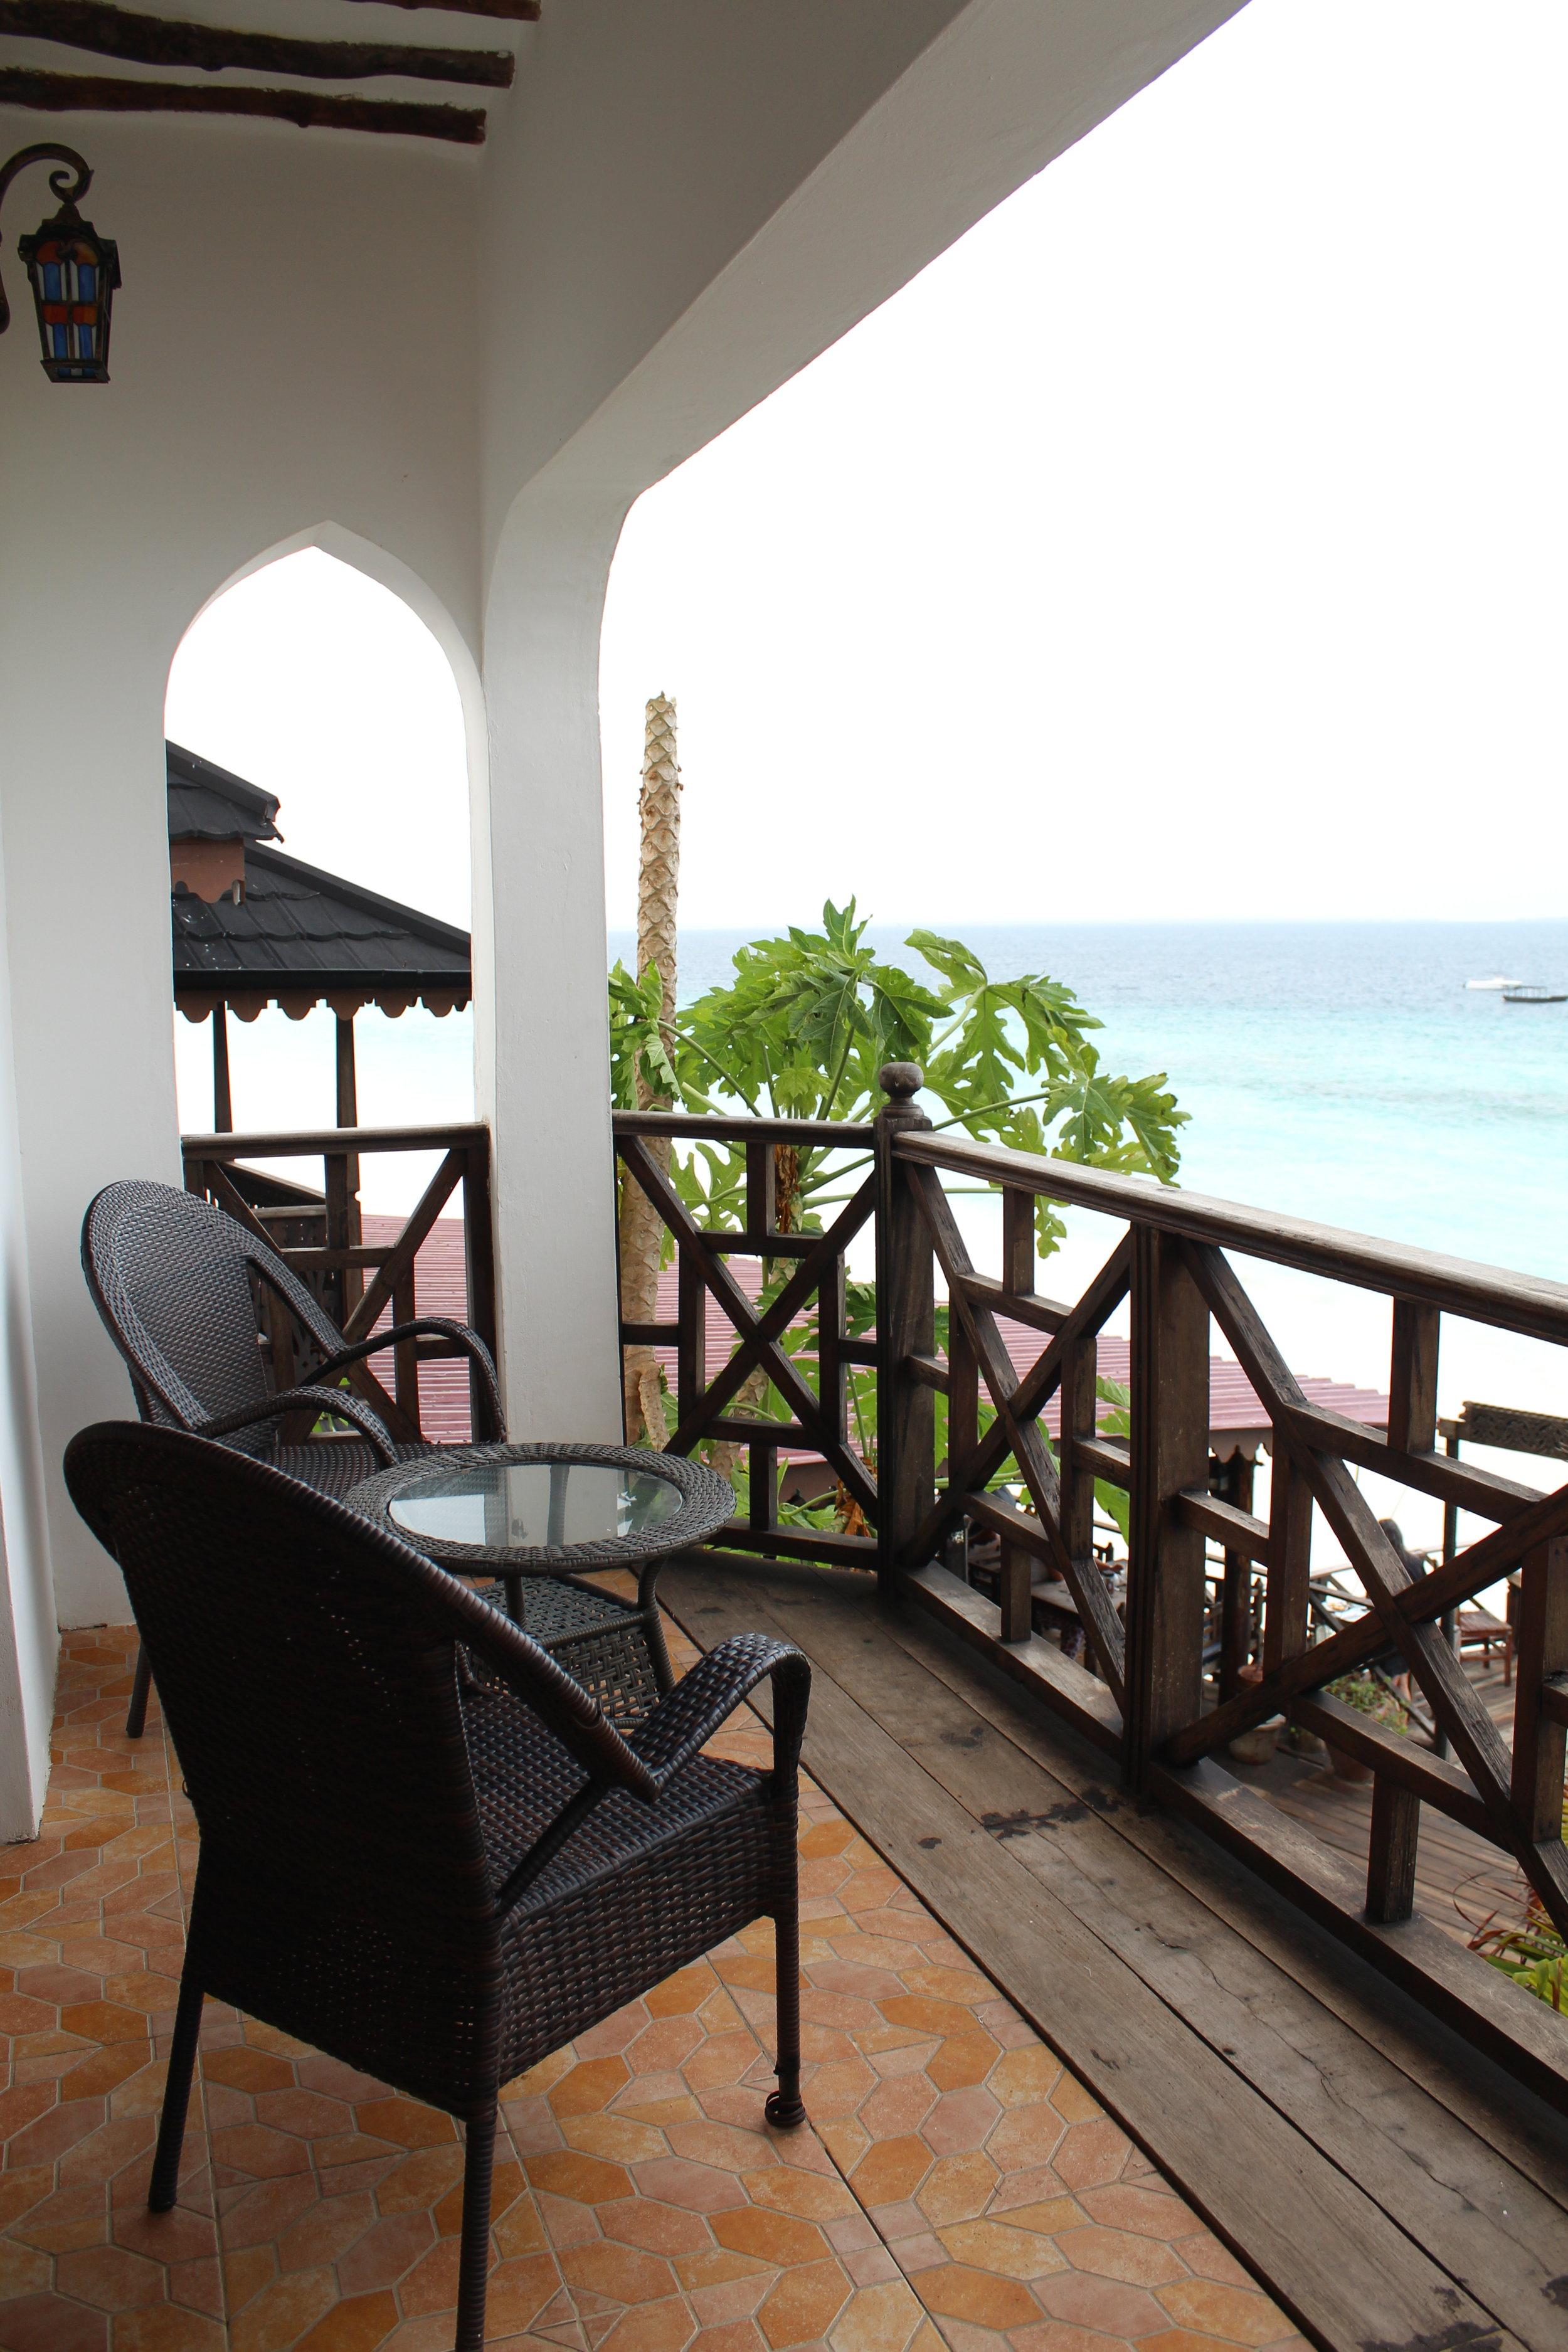 Porch with a view at Langi Langi Beach Bungalows